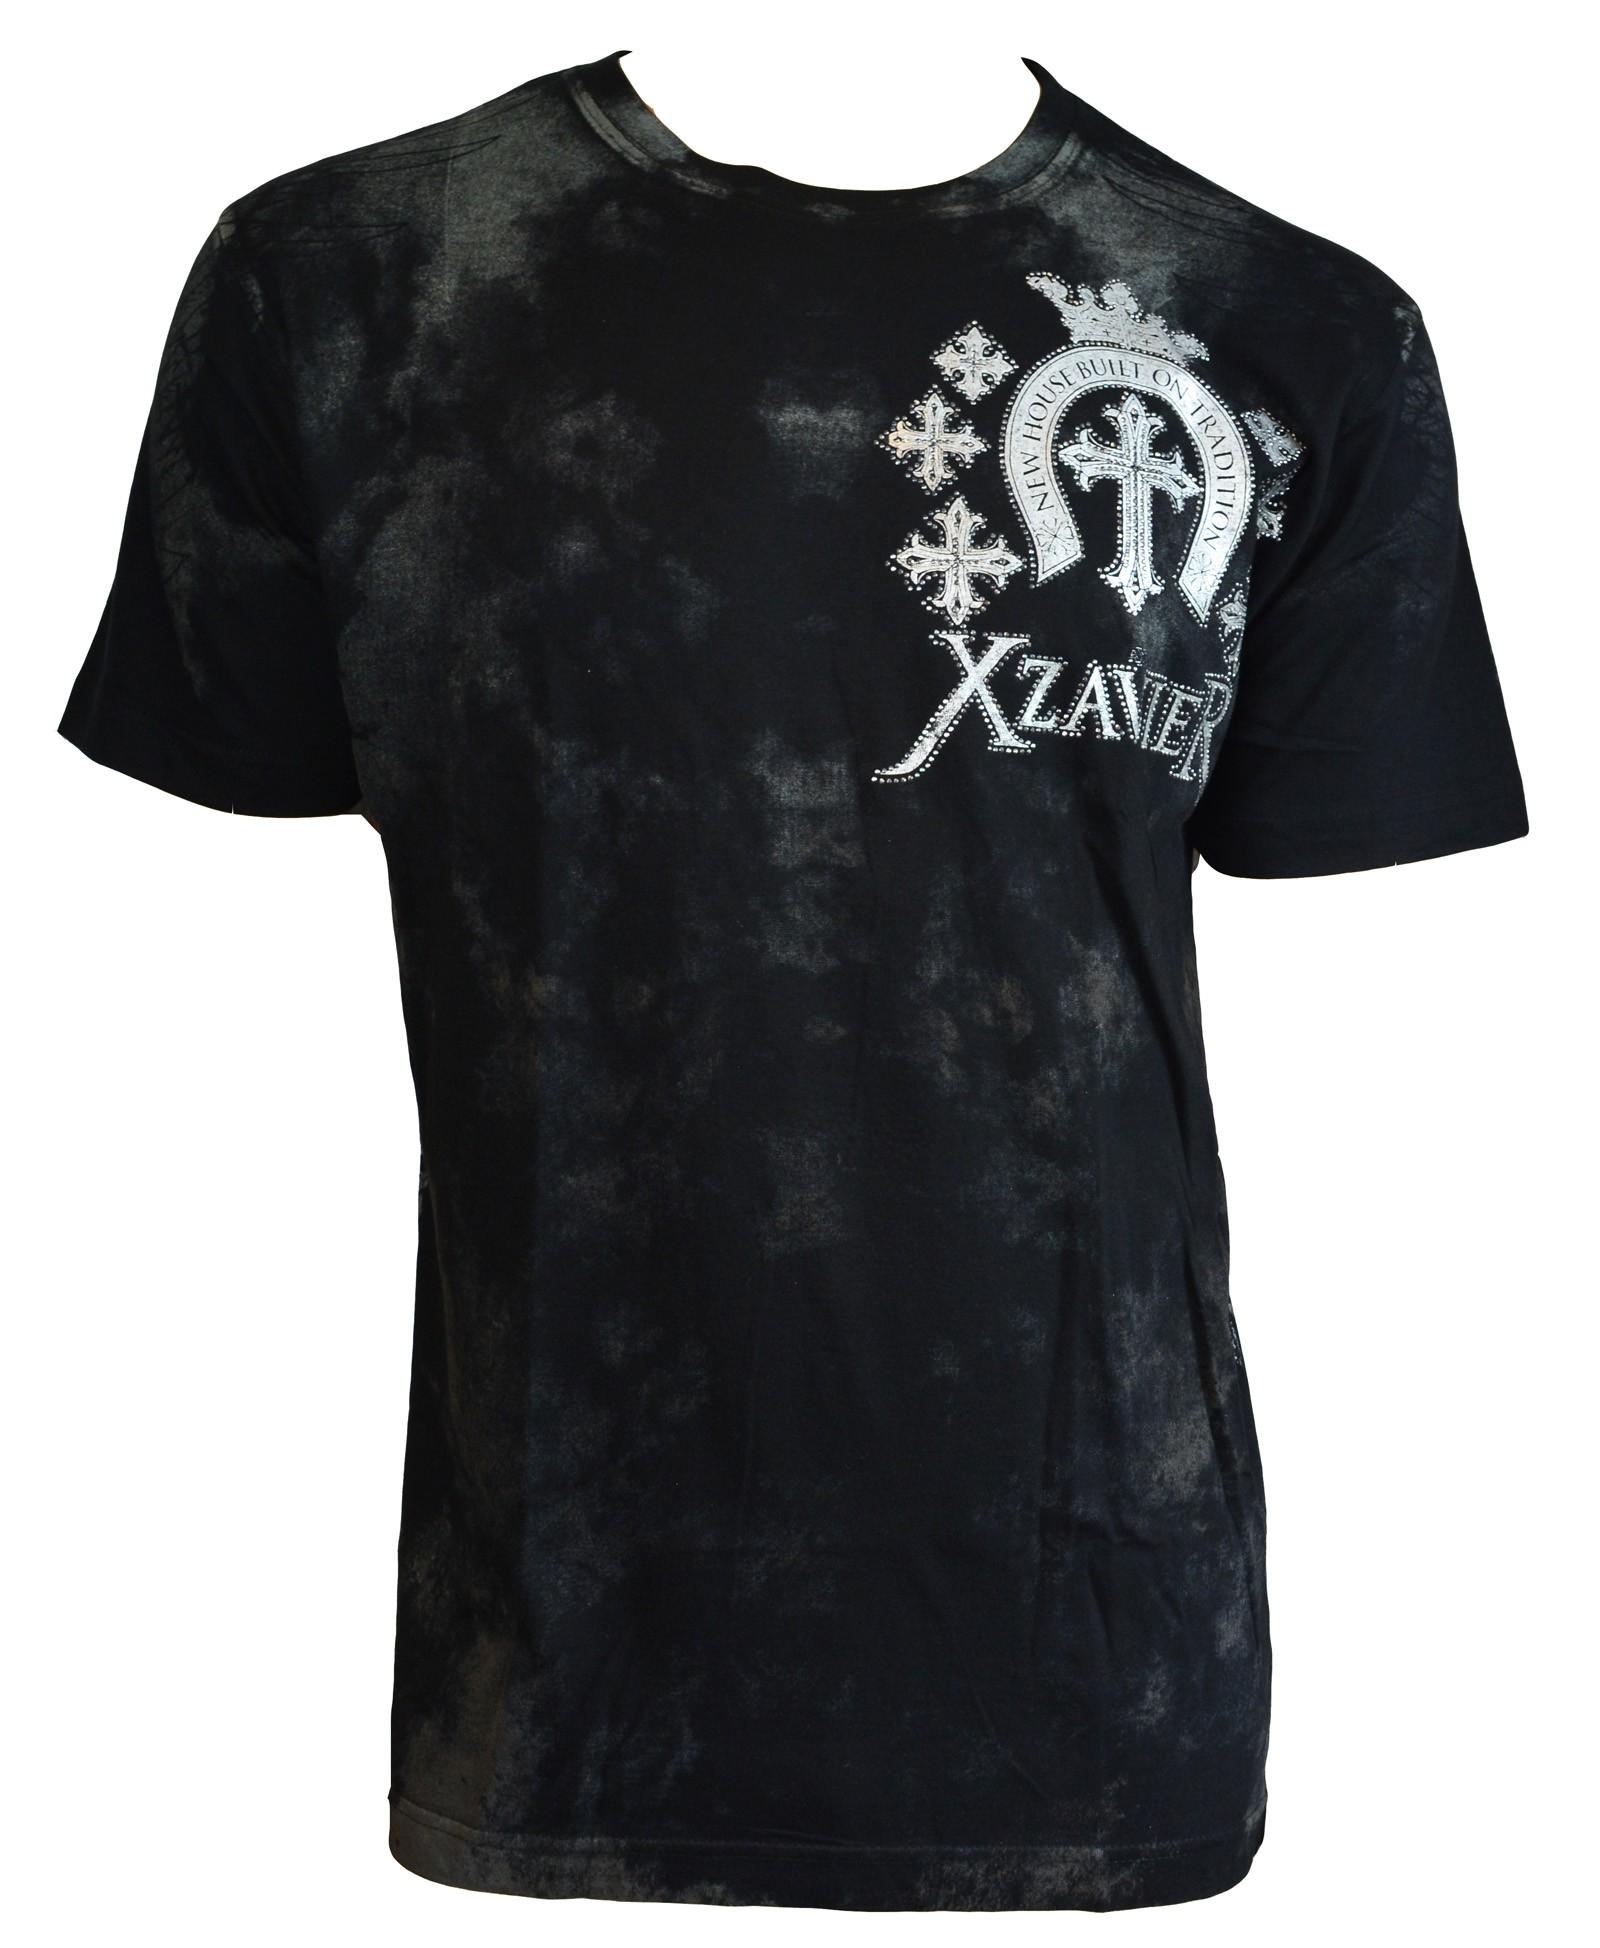 Xzavier - Tradition Wings Rhinestones/Strass T-Shirt